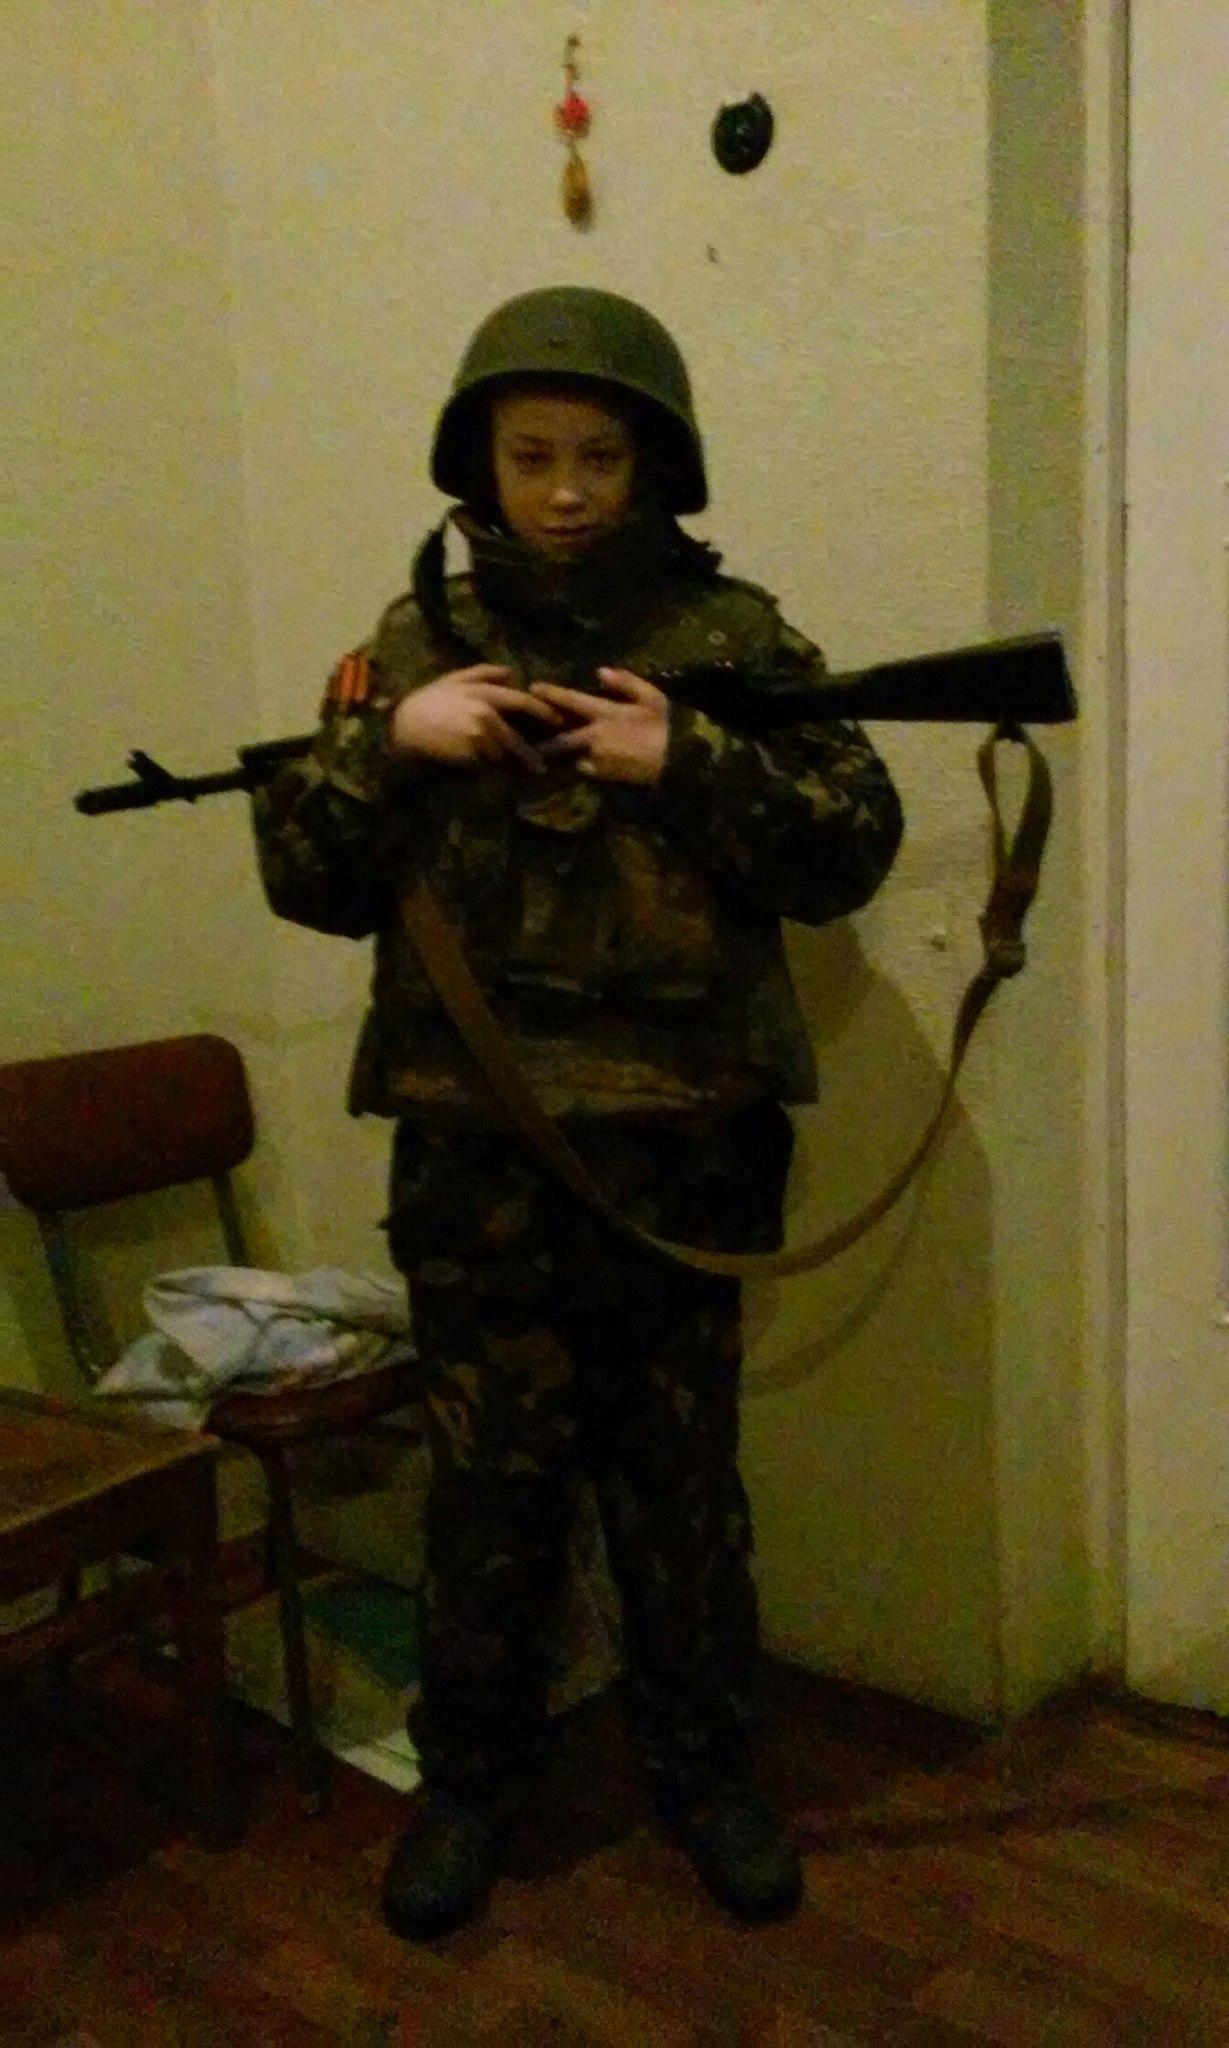 """Привіт, солдате. Ти мене не знаєш. Чому пишу? Війна торкнулася душі"", - кировоградские школьники записали видеообращение к украинским бойцам на Донбассе - Цензор.НЕТ 5423"